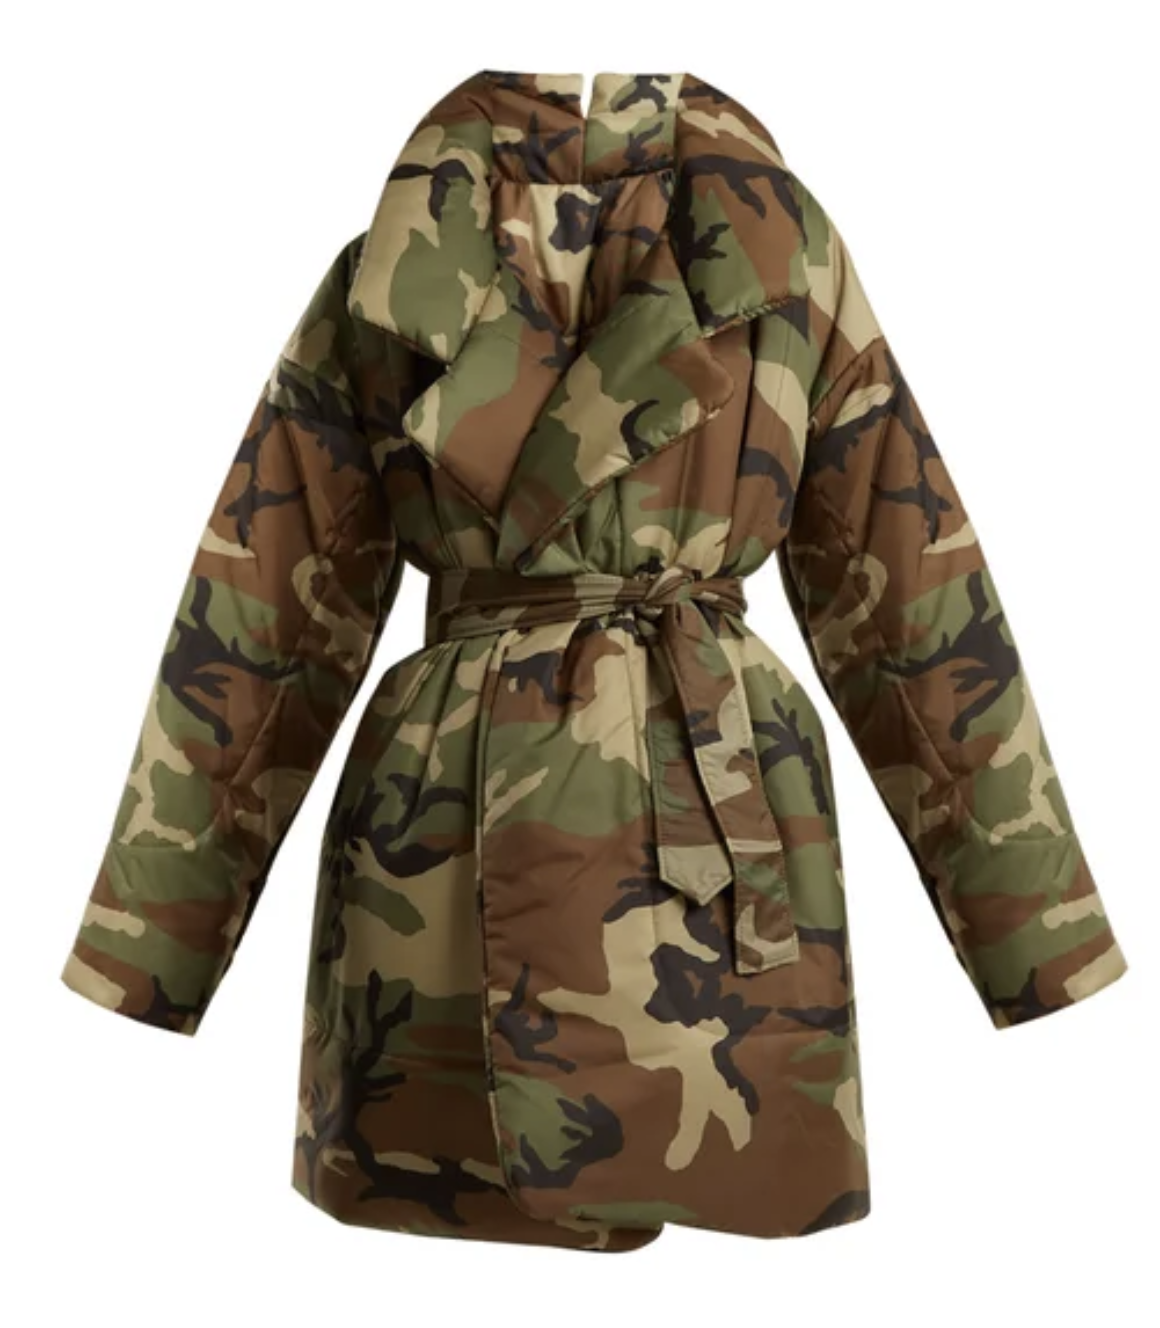 Norma Kamali  Camo-print sleep bag knee length coat.